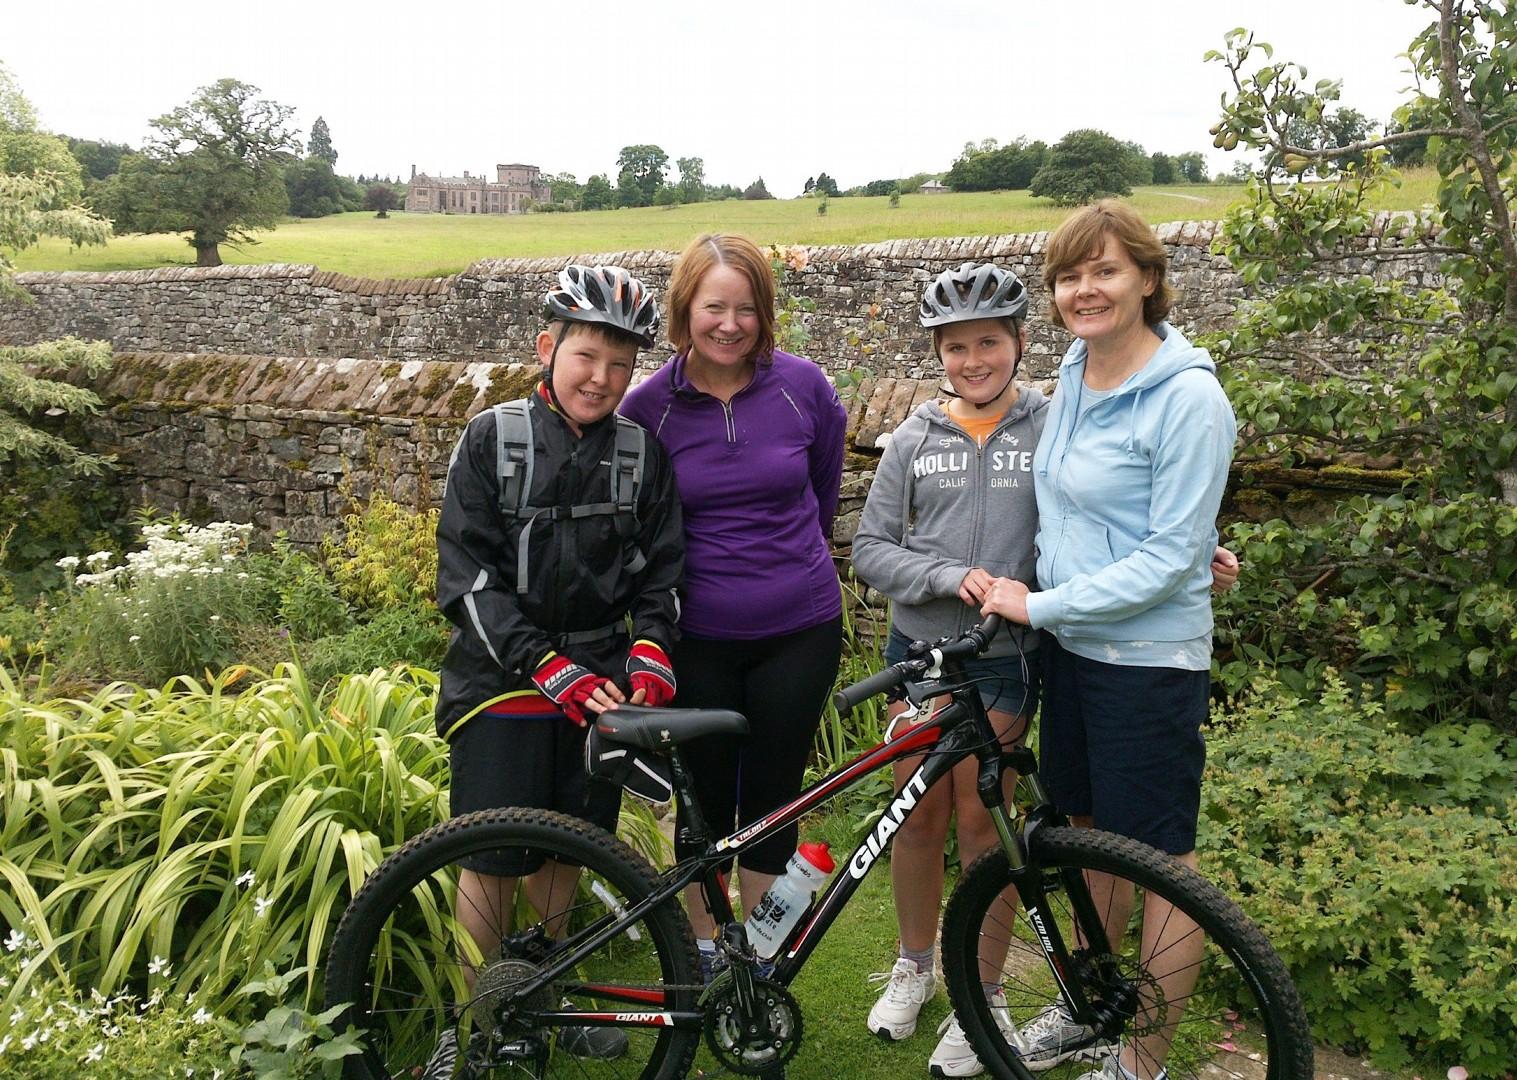 family-guided-bike-skills-uk-lake-district-cycling-holiday.jpg - UK - Lake District - Guided Family Bike Skills - Family Cycling